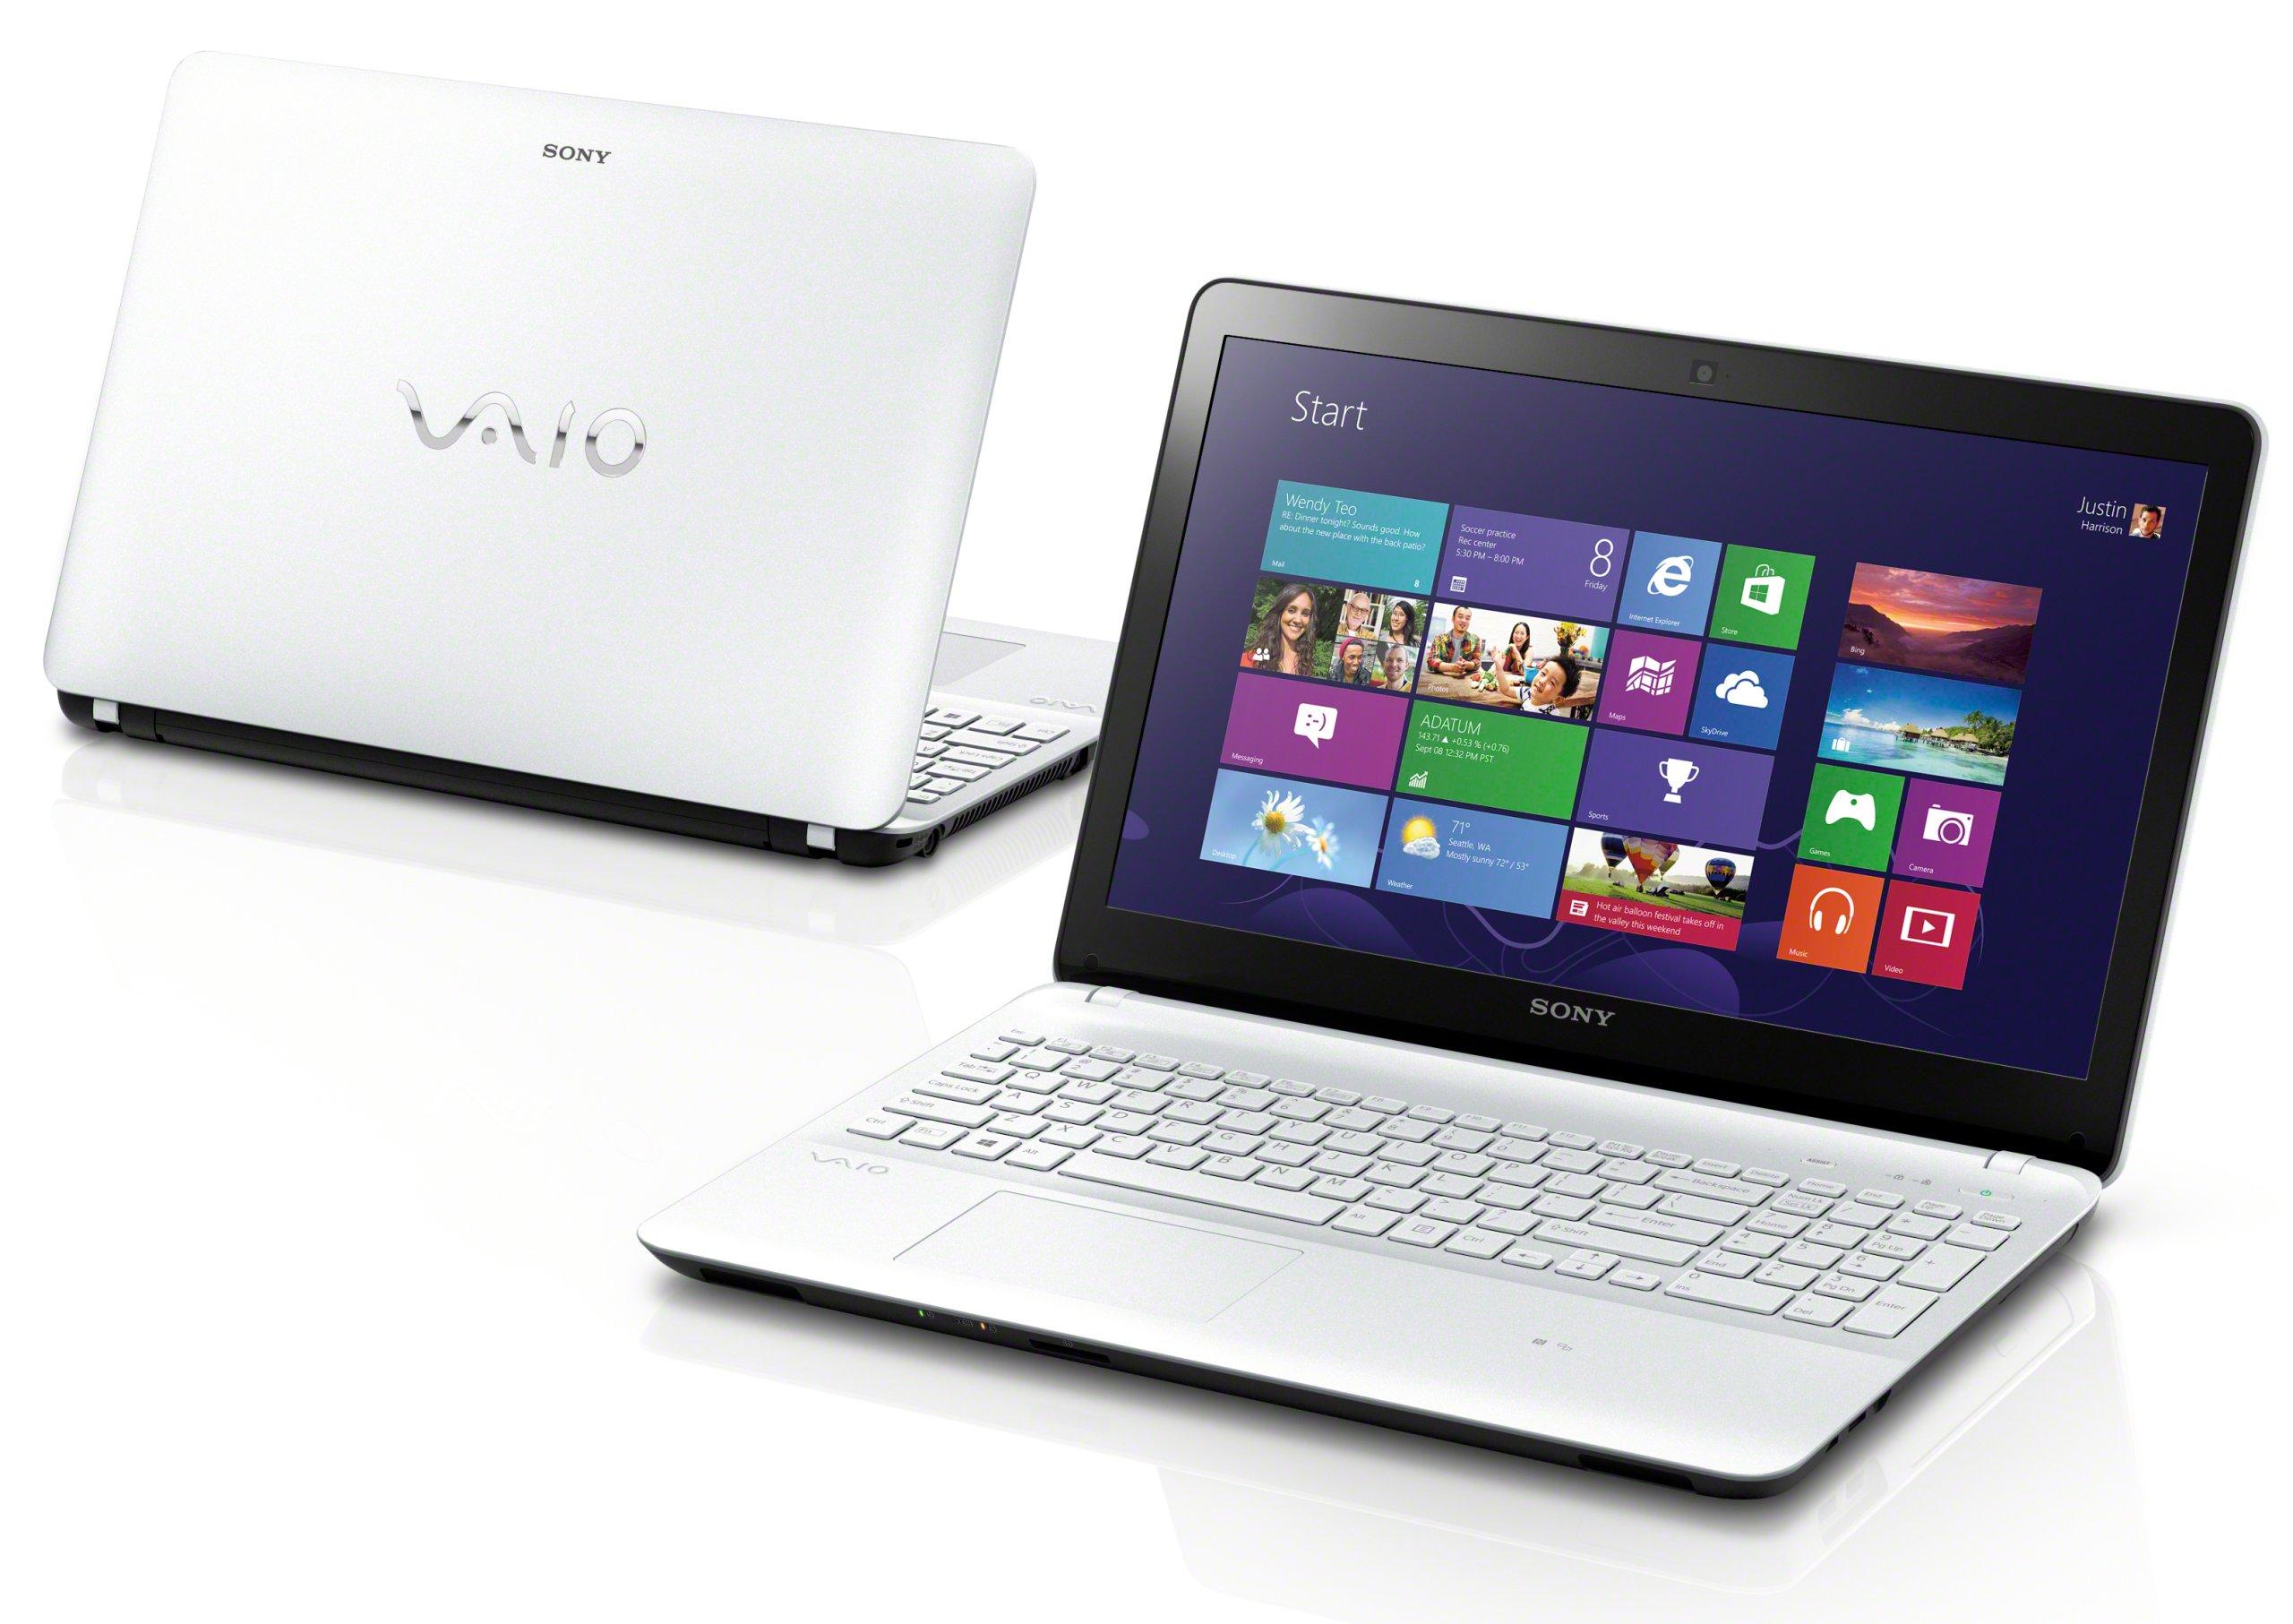 Sony-Vaio-SVF1521C6EW